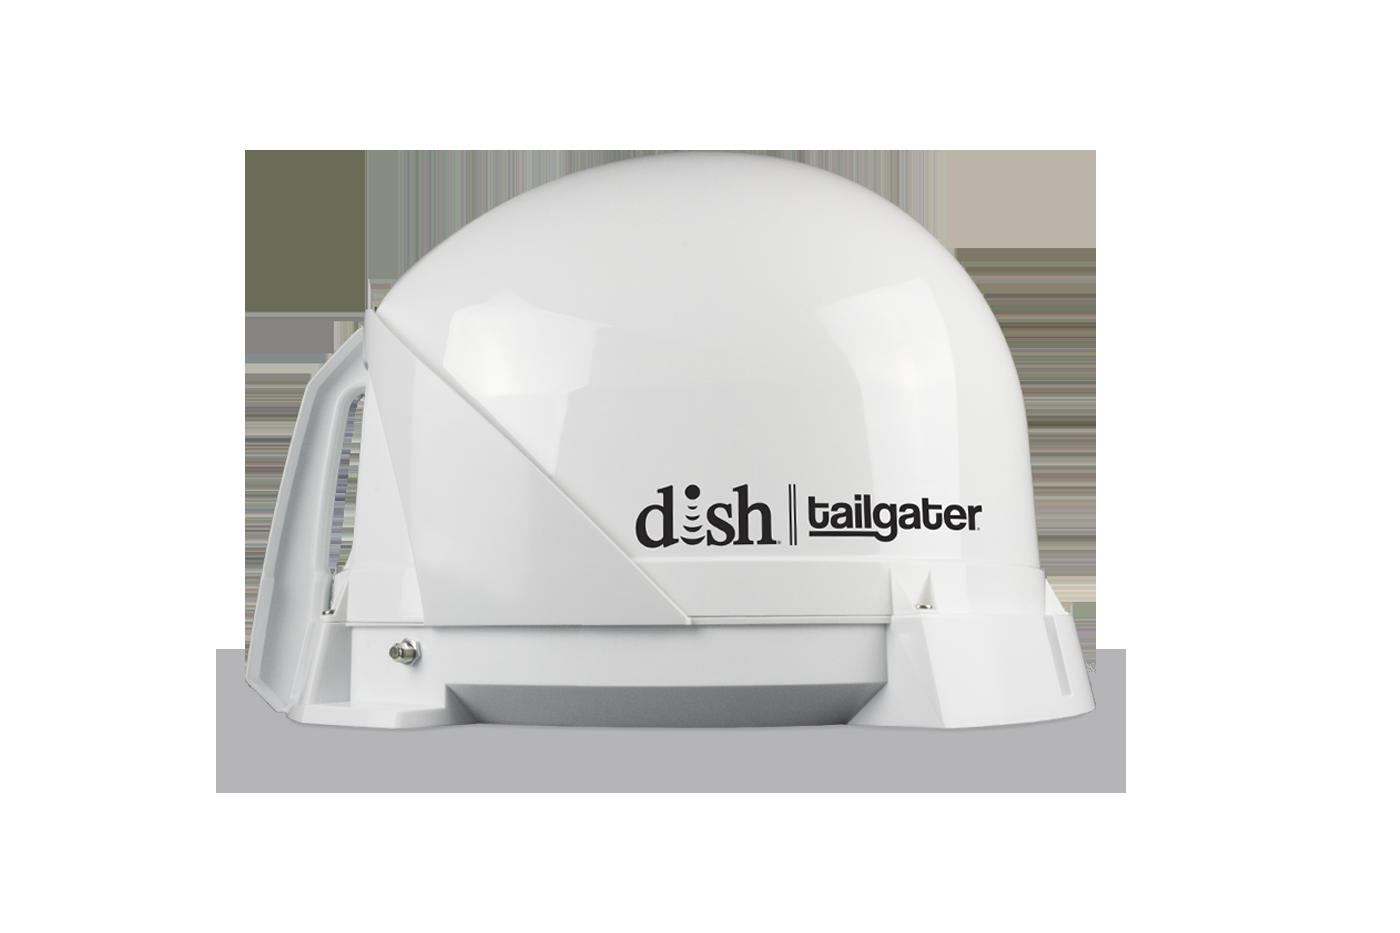 White DISH tailgater antenna